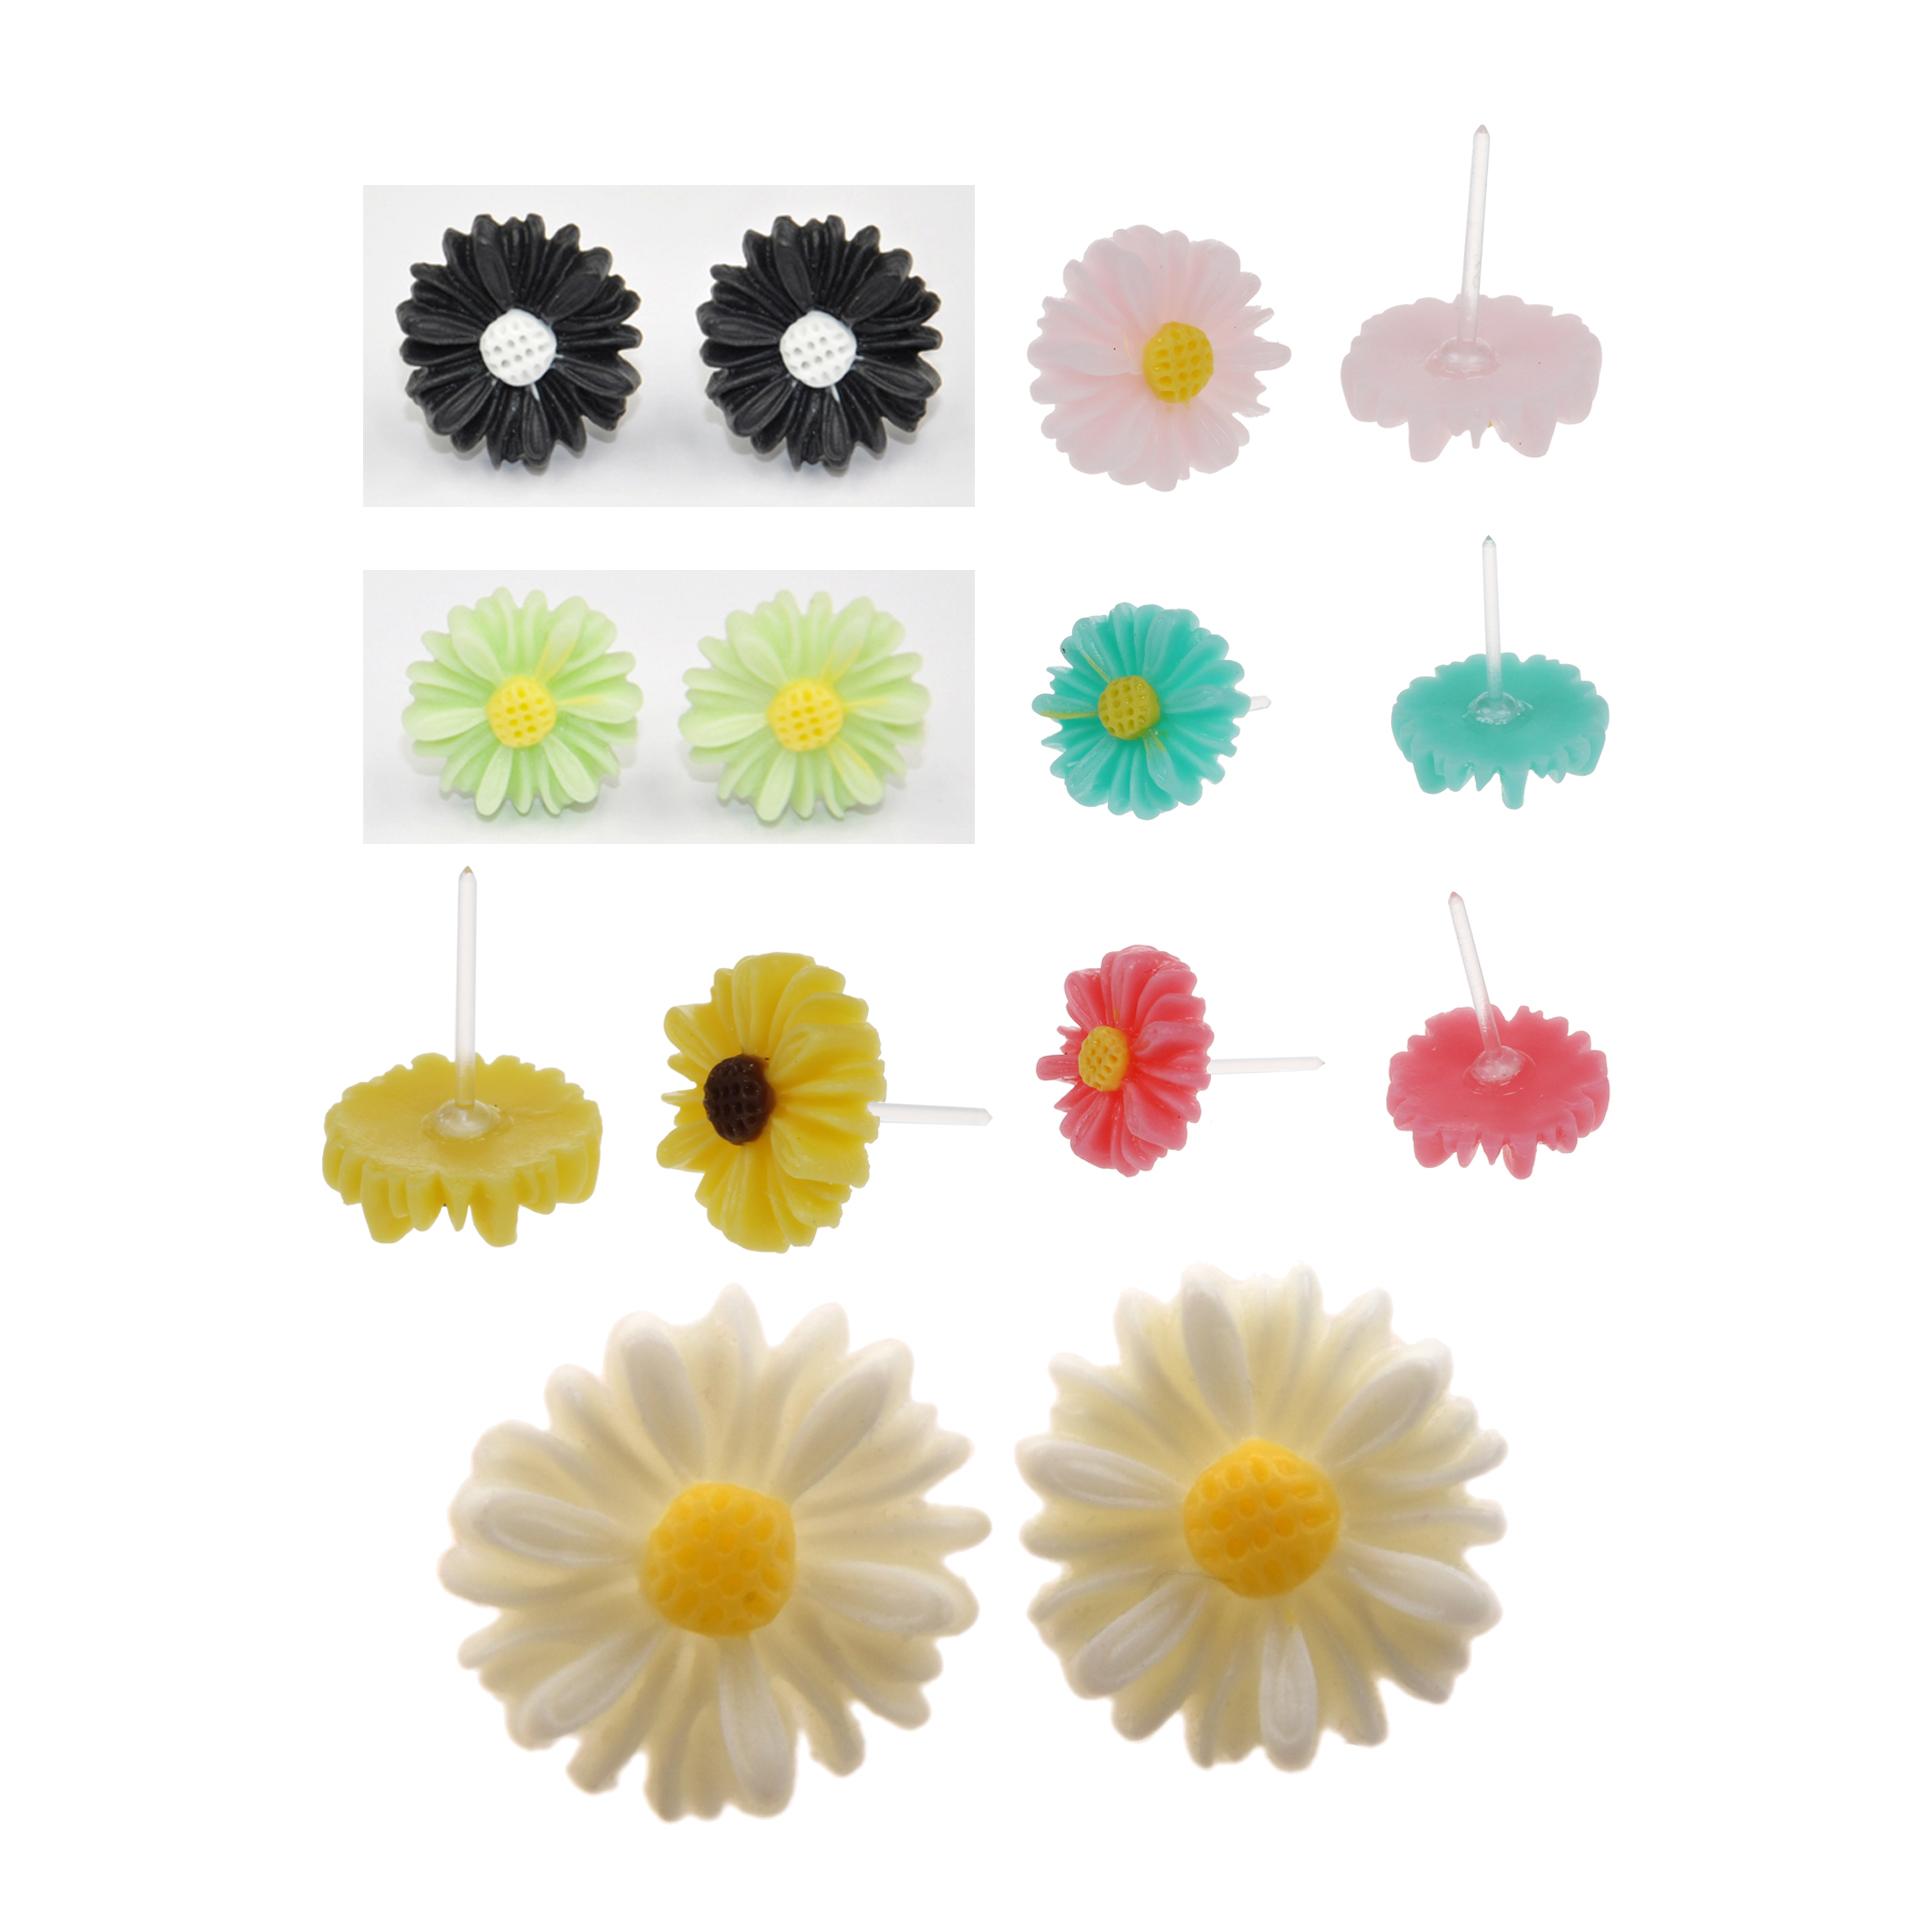 853fba8ea6ae50 Cute Vintage Style Cute Small Daisy Flower Stud Earrings new J8G8 | eBay